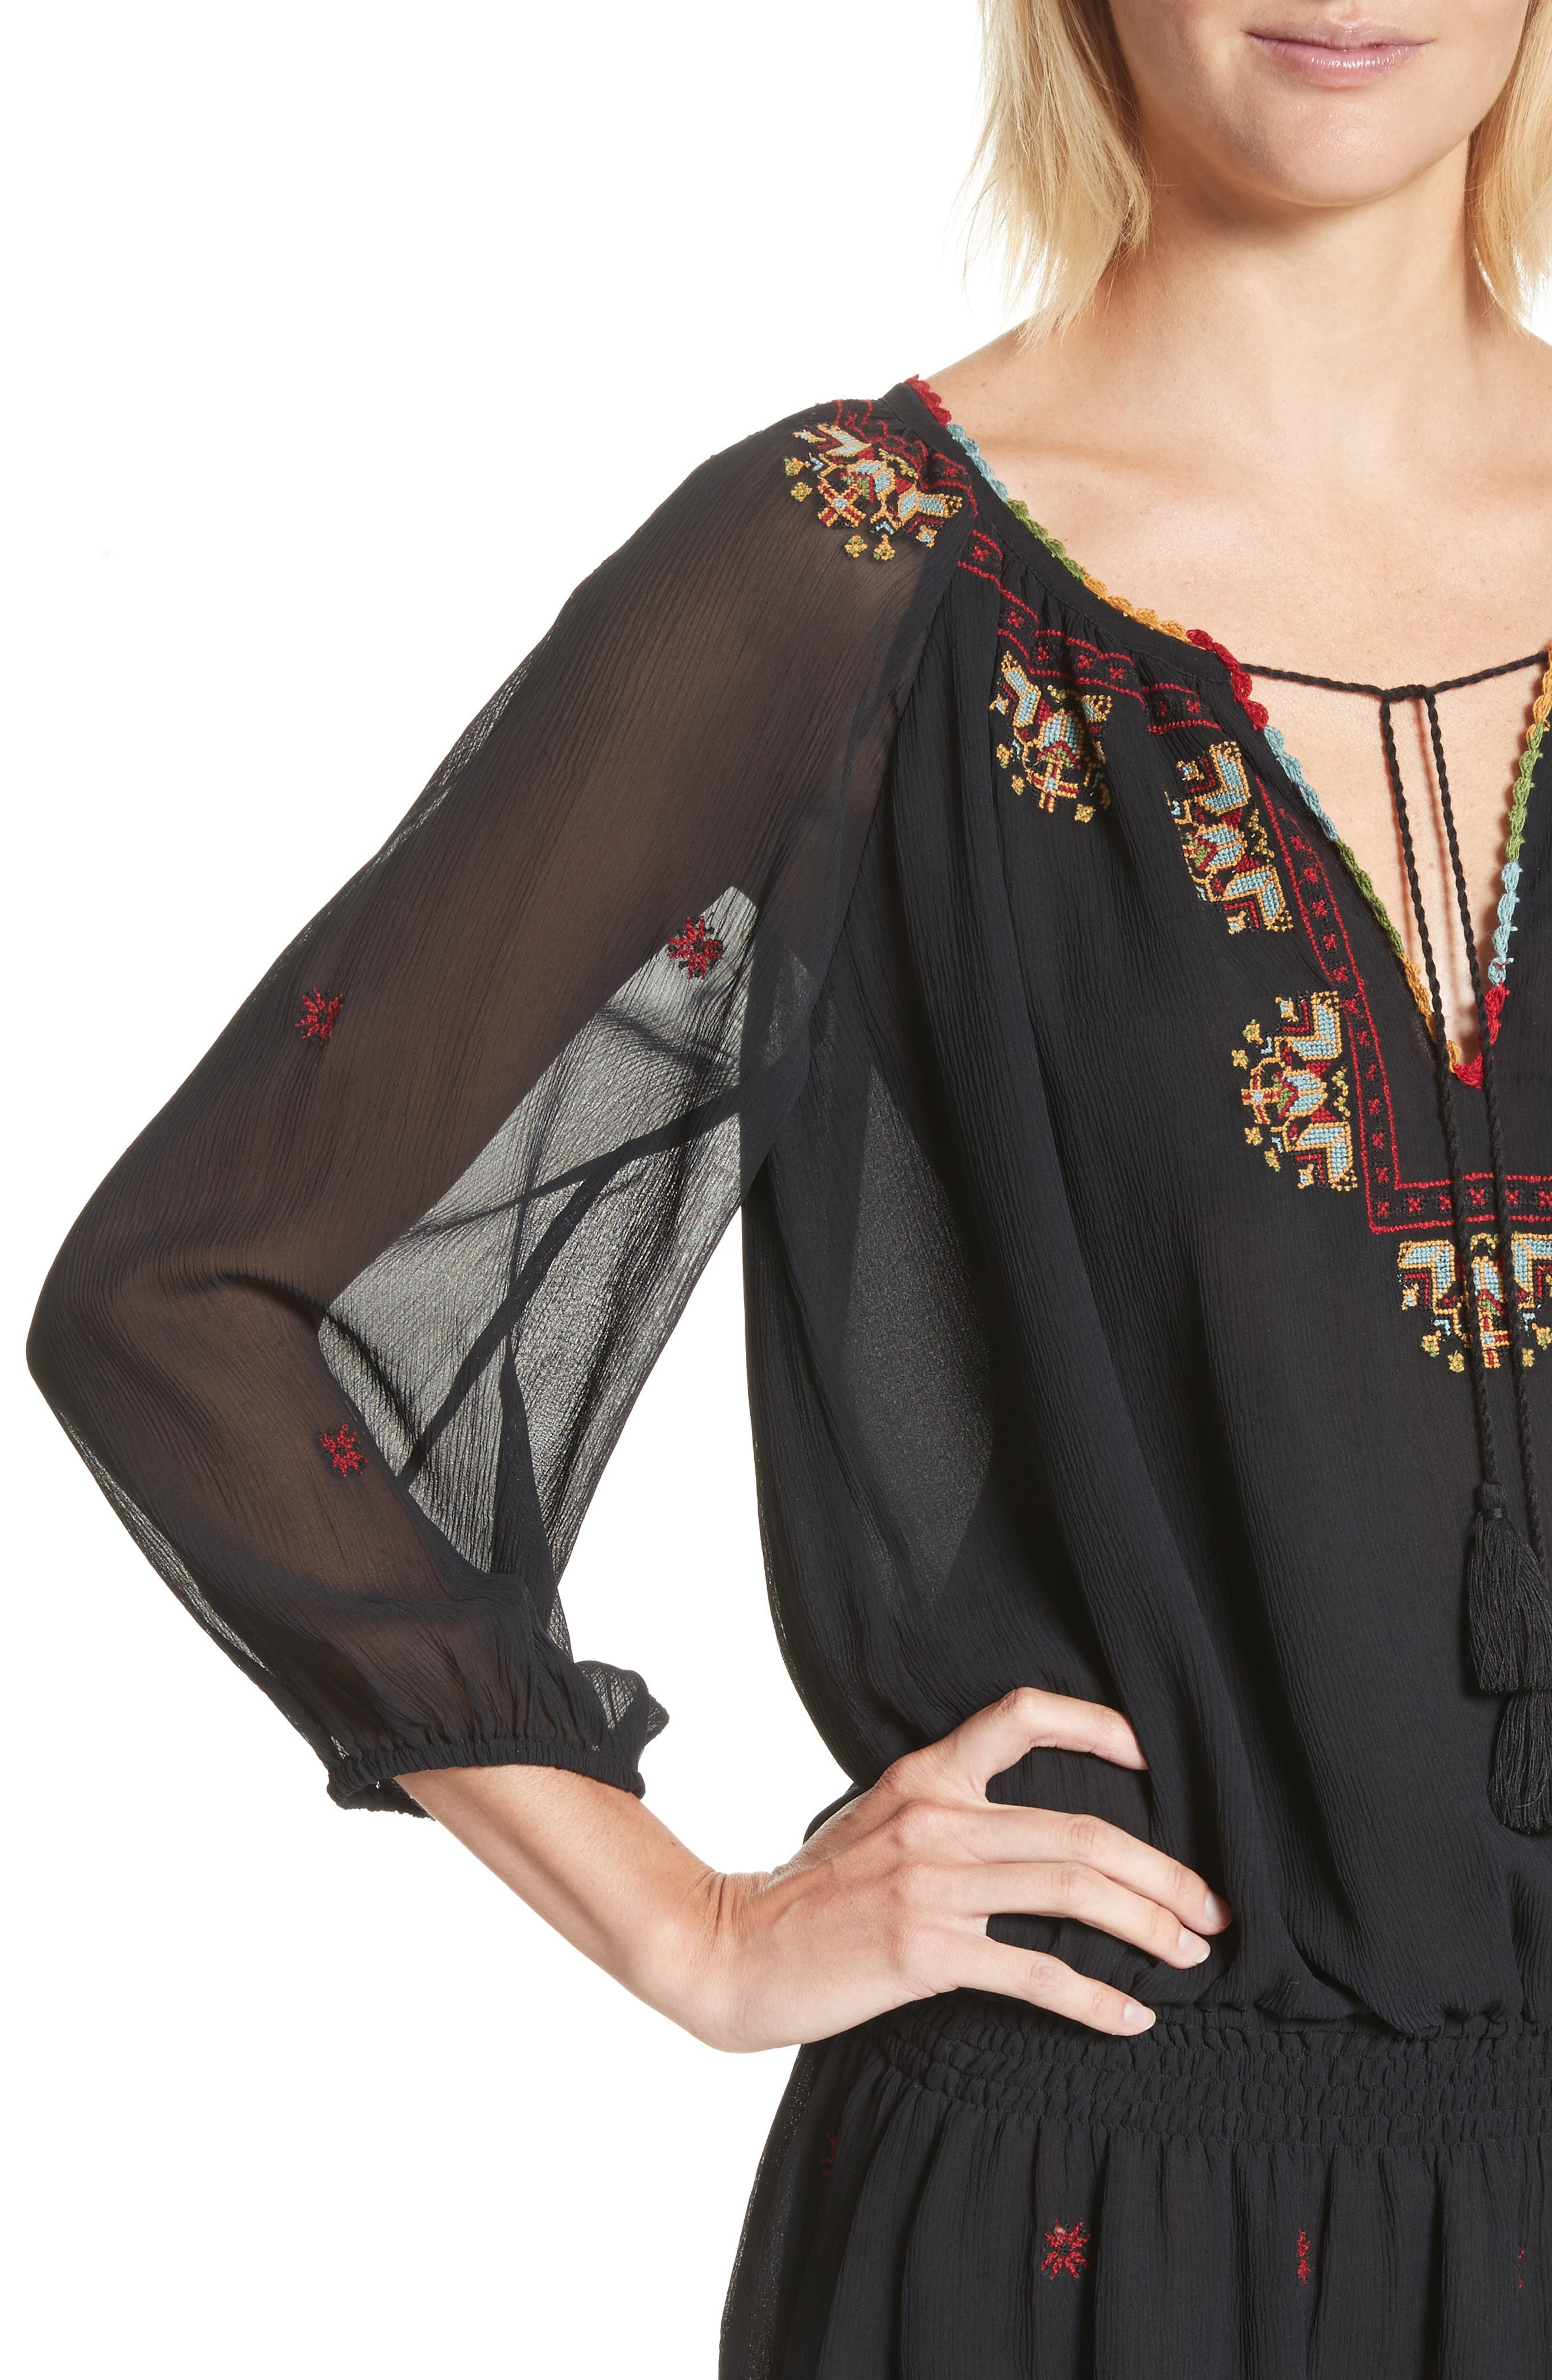 Geromine Blouson Silk Dress,                             Alternate thumbnail 4, color,                             Caviar